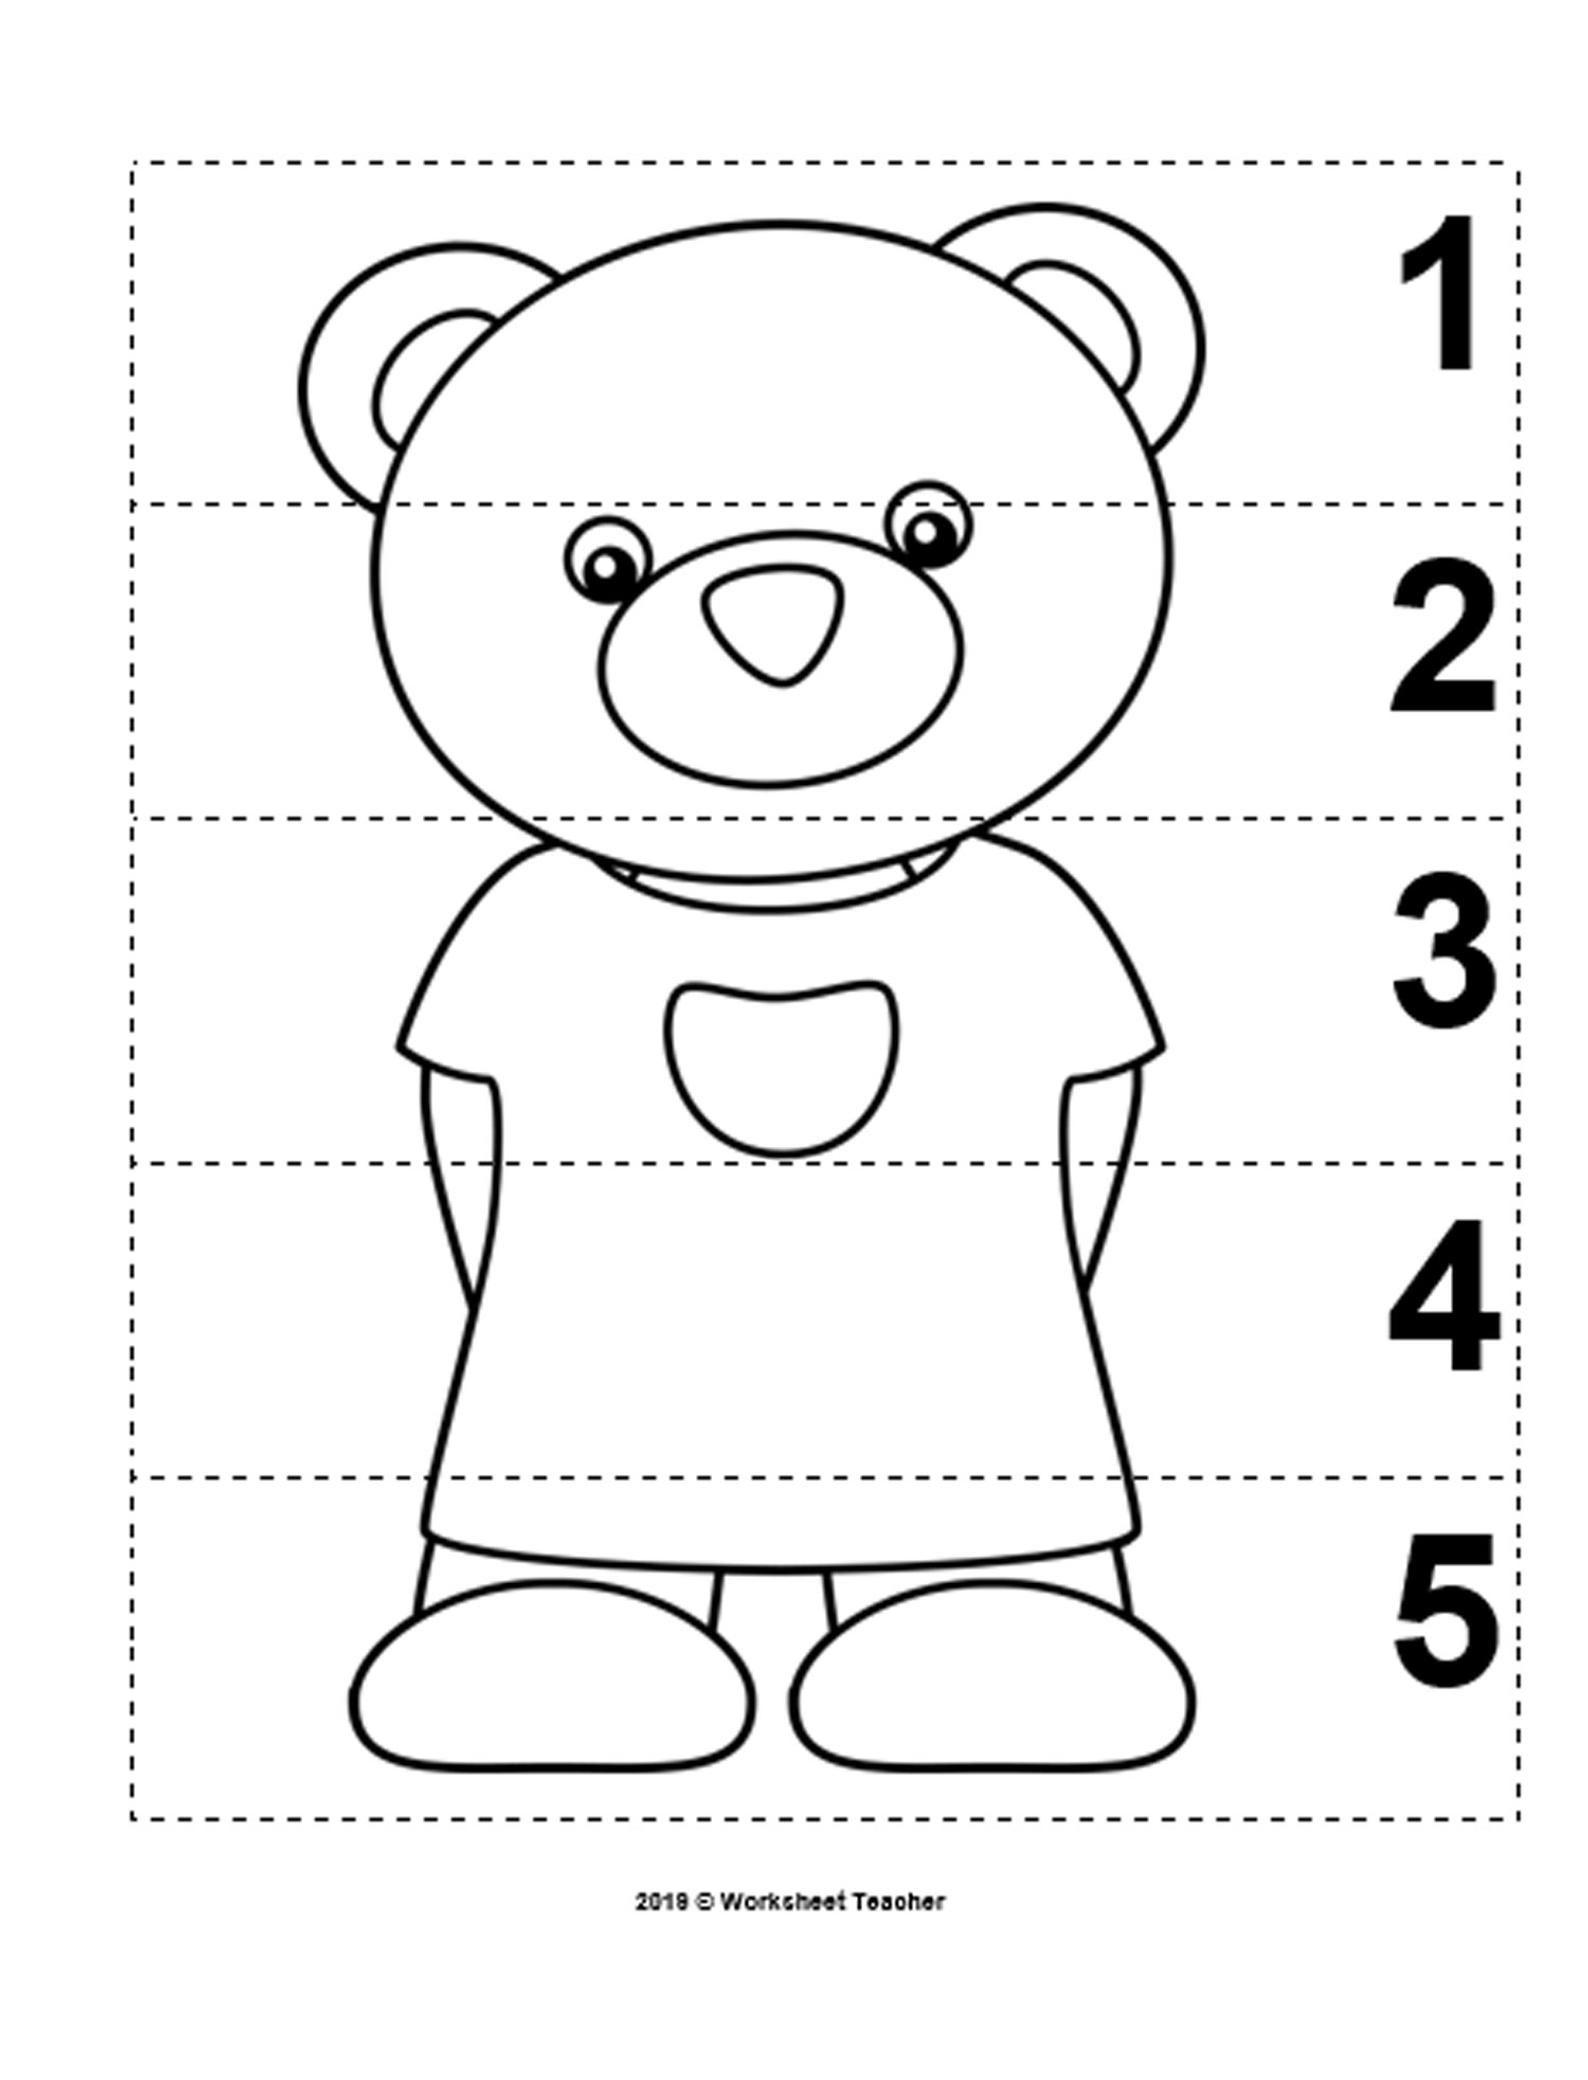 10 Goldilocks And The Three Bears Preschool Curriculum Etsy Bears Preschool Goldilocks And The Three Bears Preschool Curriculum Activities [ 2080 x 1588 Pixel ]